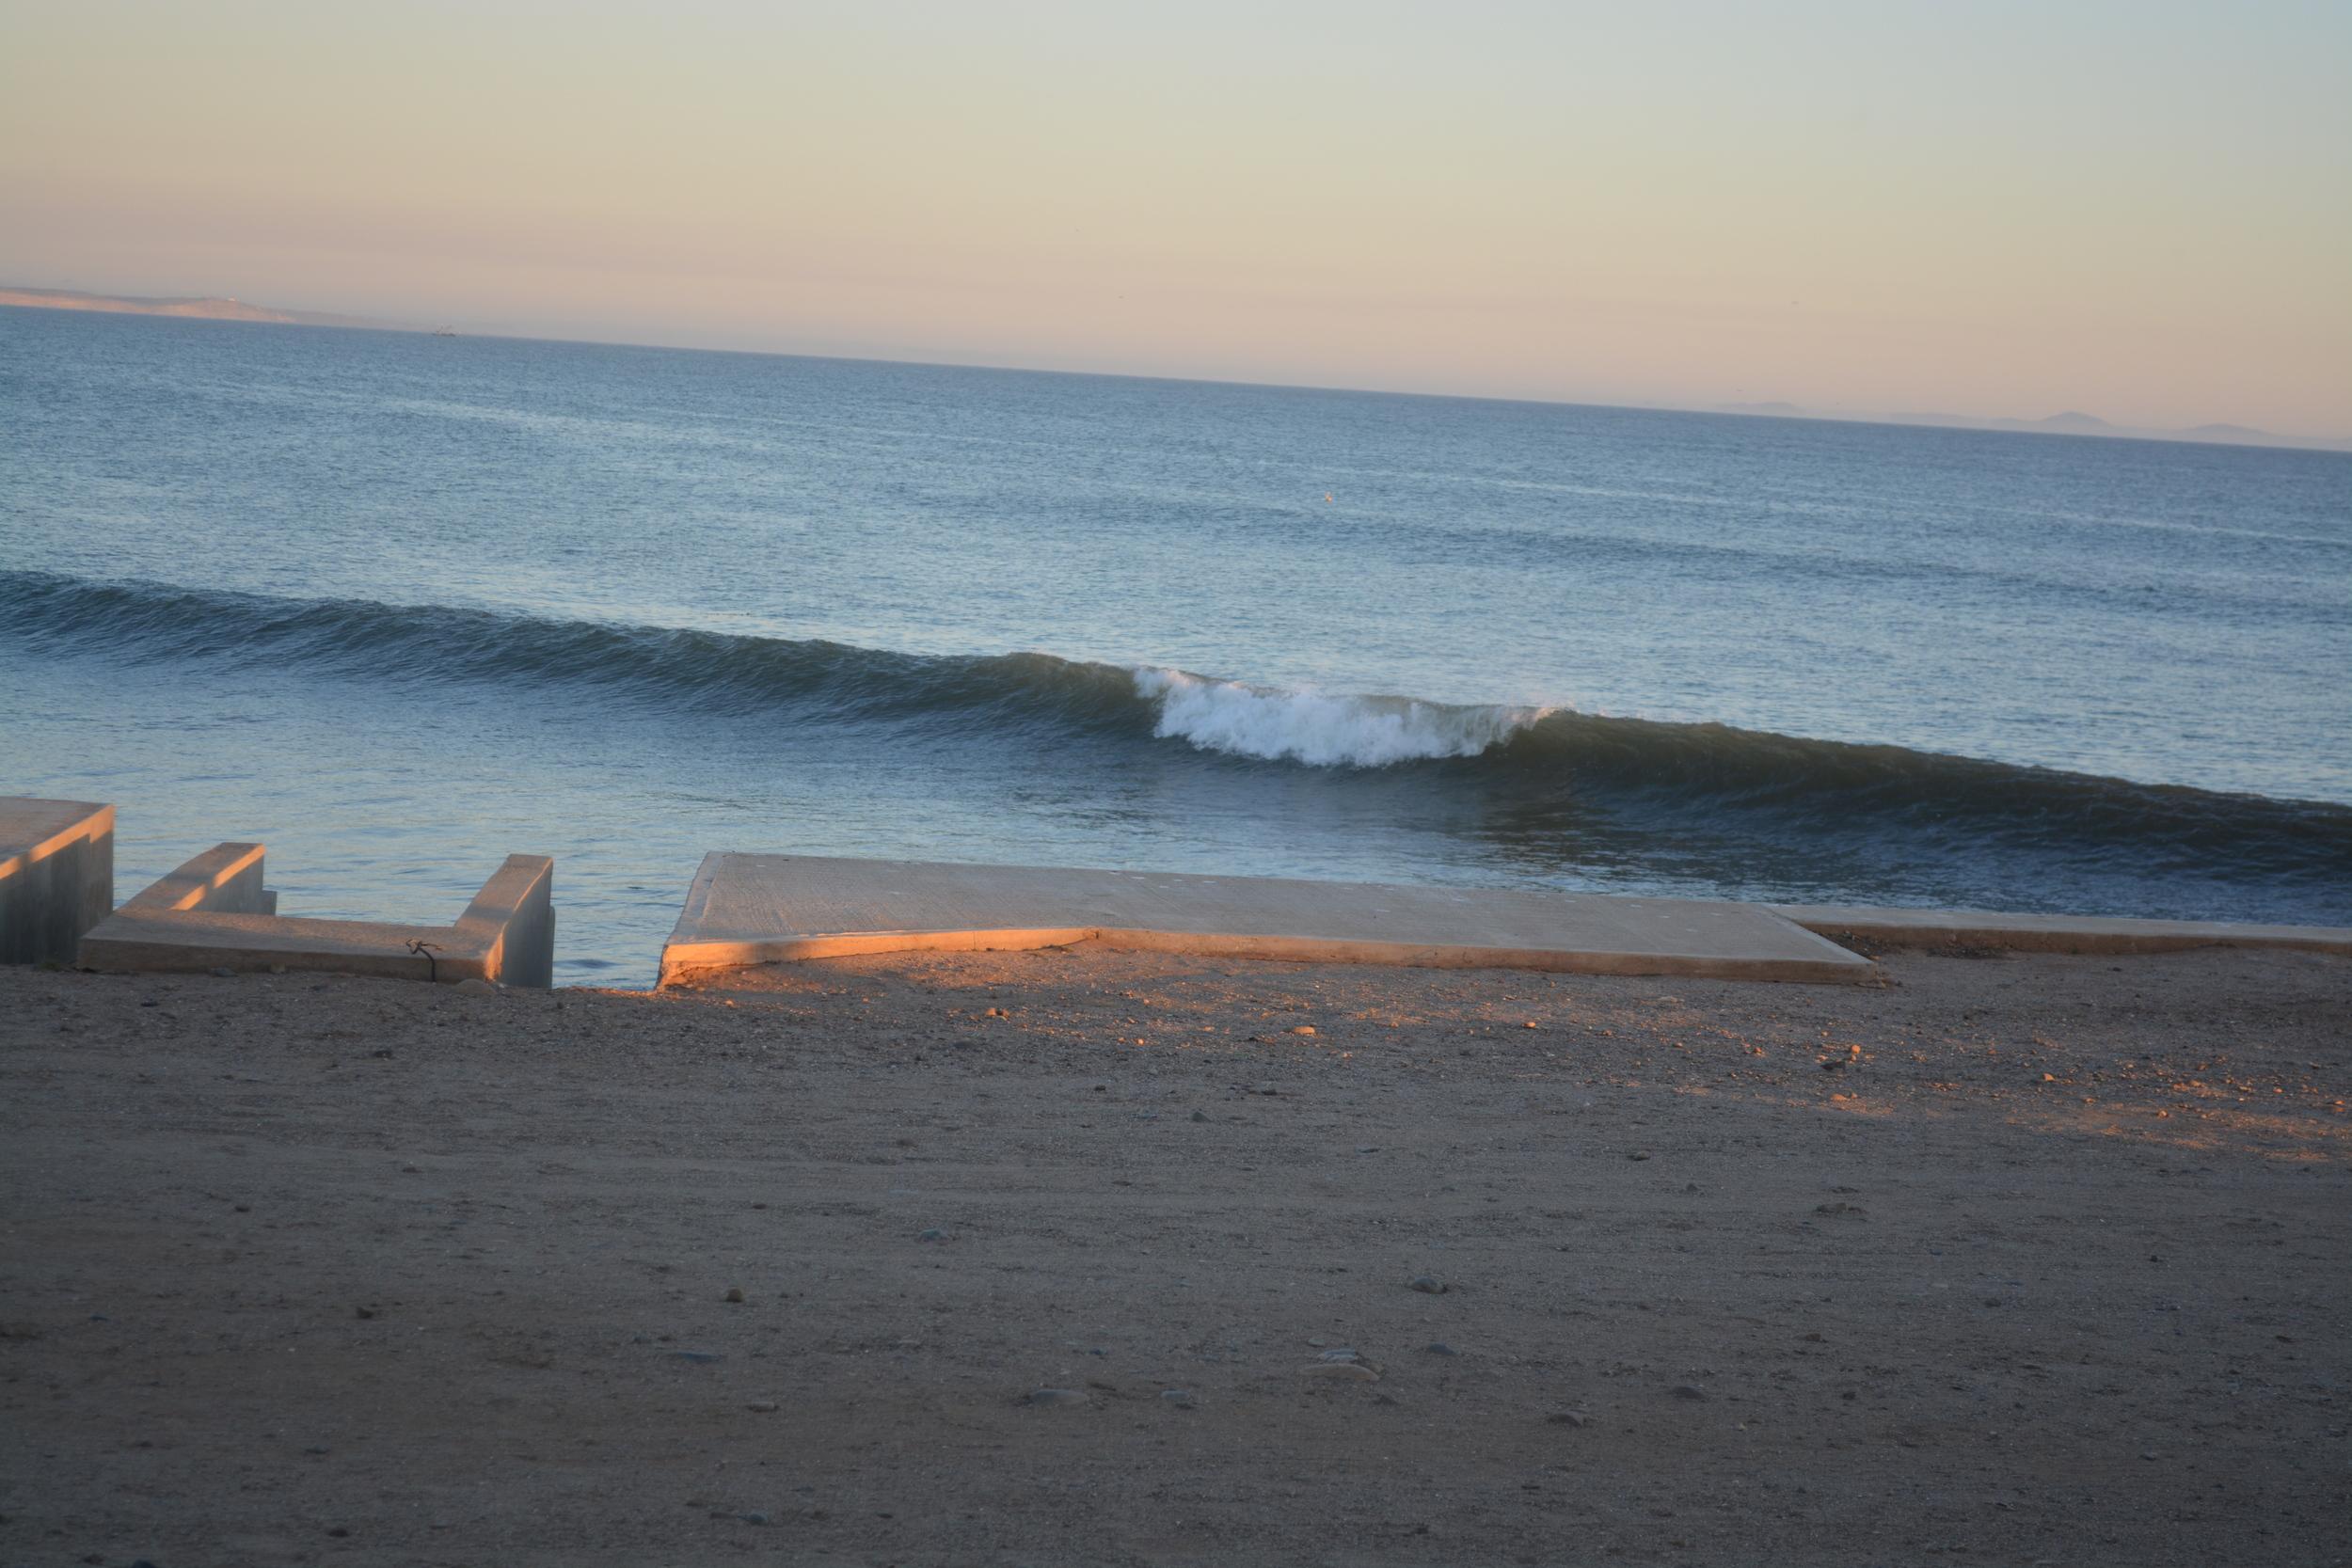 Baja California 10-5-13 Shipwrecks Surfing Adventure Ocean Experience Surf School San Diego (23).JPG